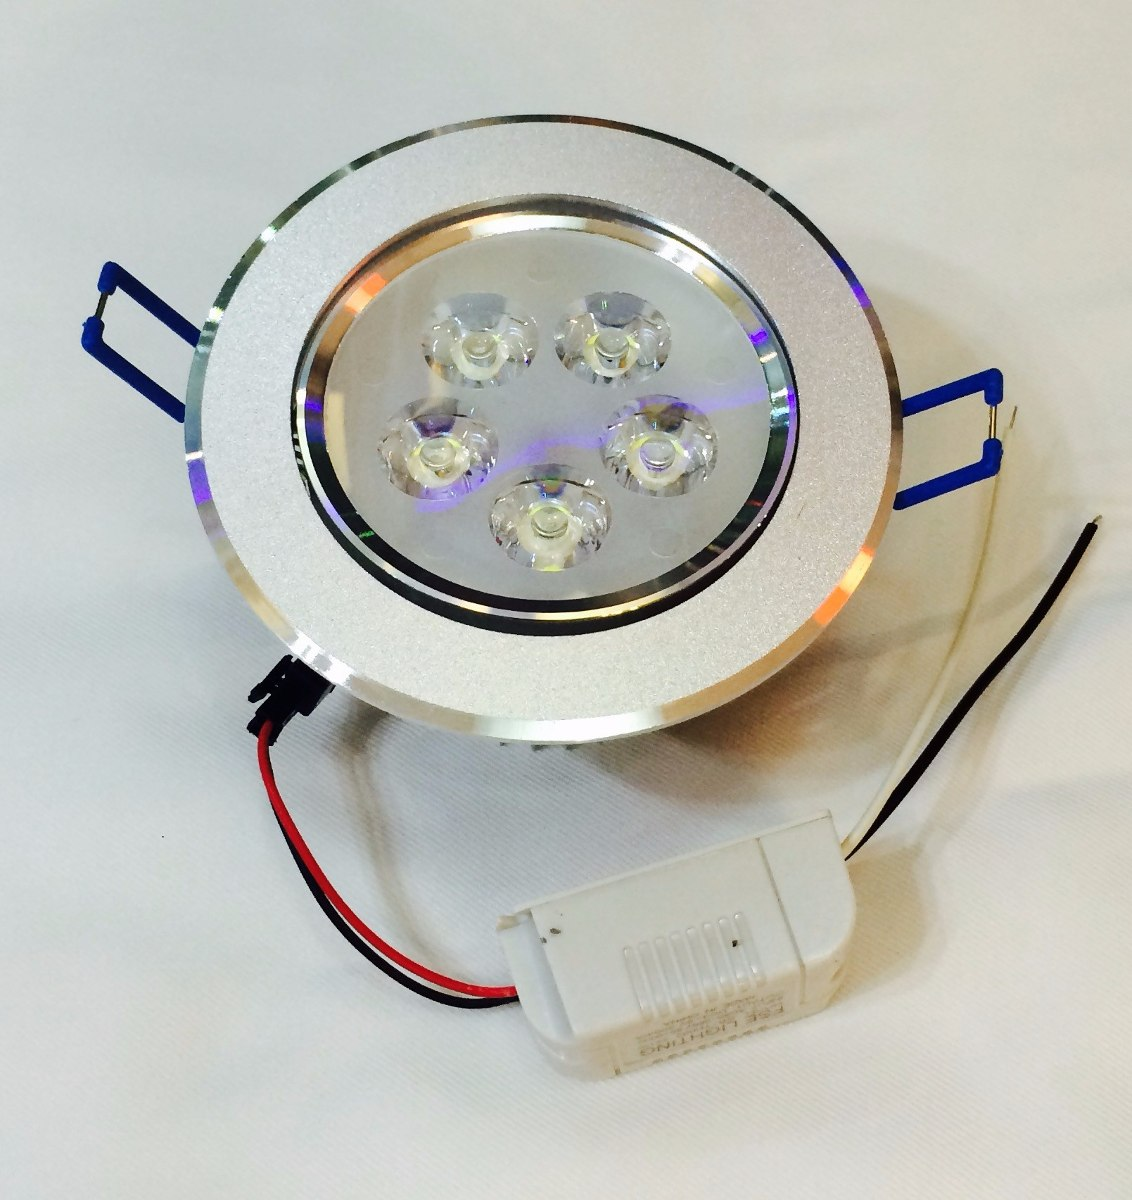 Spot base empotrable para bote incluye foco led 5 watts bf - Focos led para cocina ...